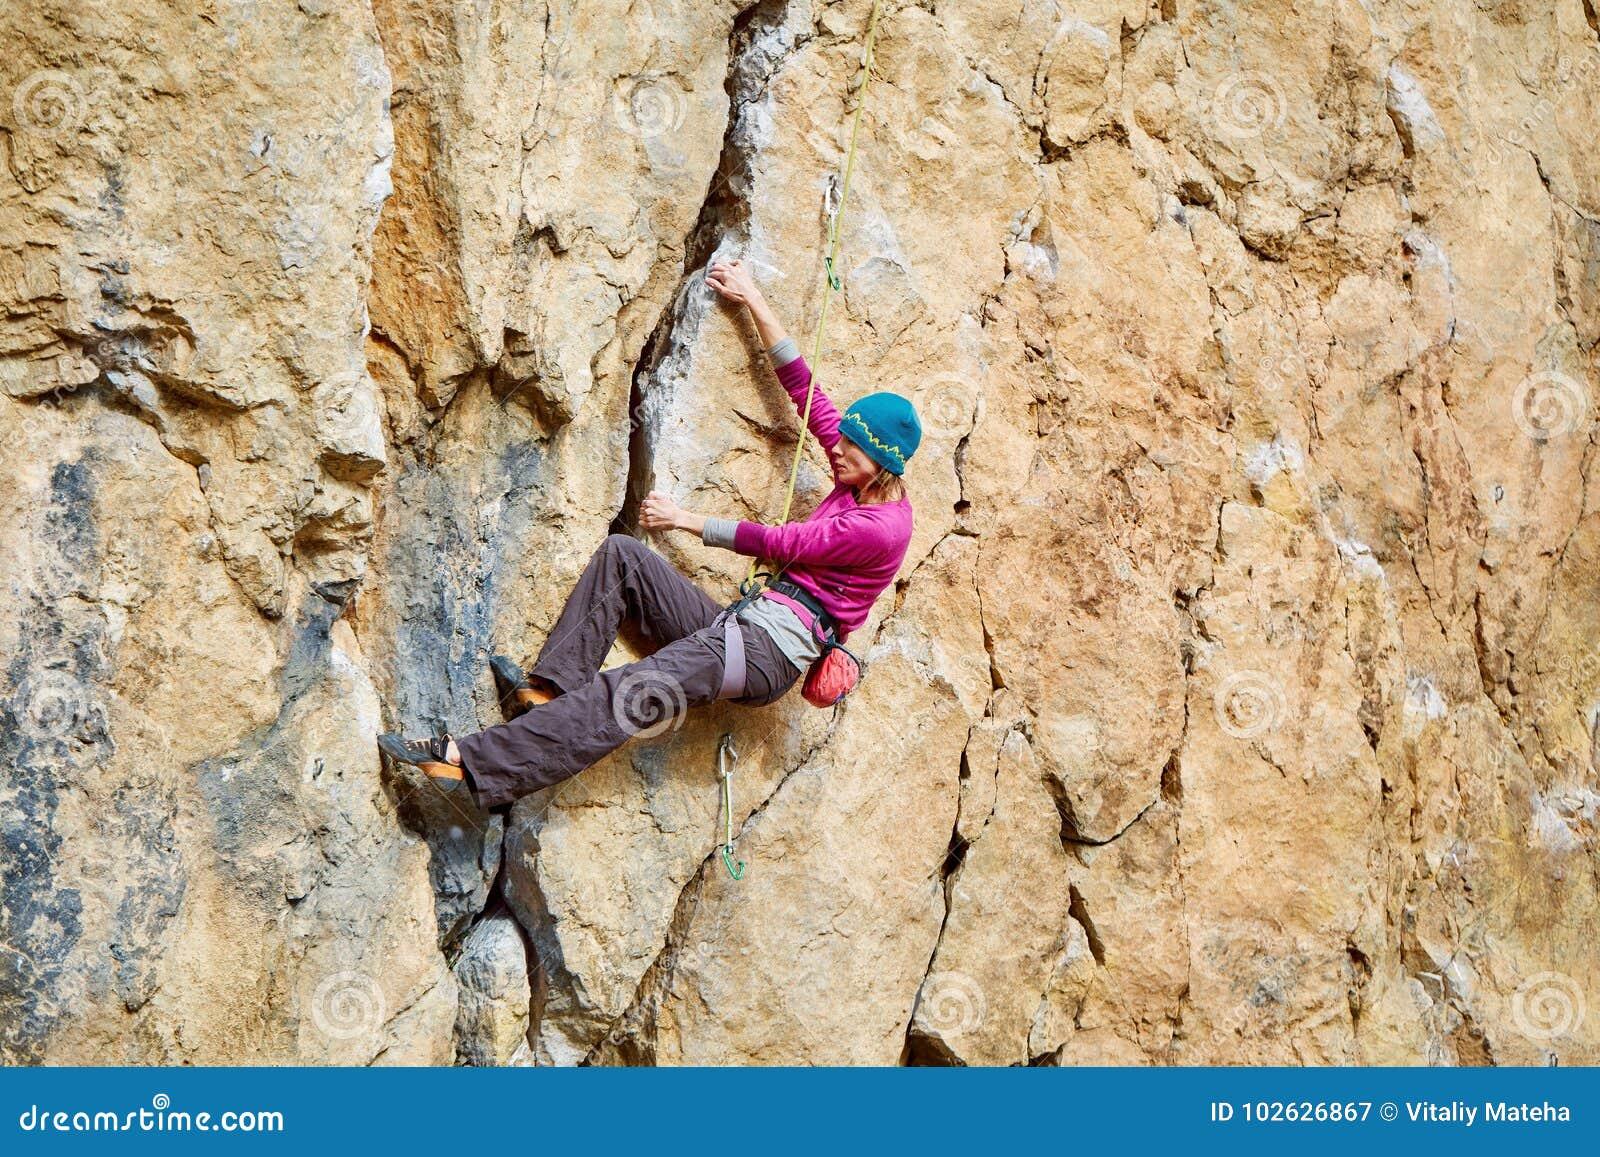 Female rock climber on overhanging cliff, Kalymnos Island